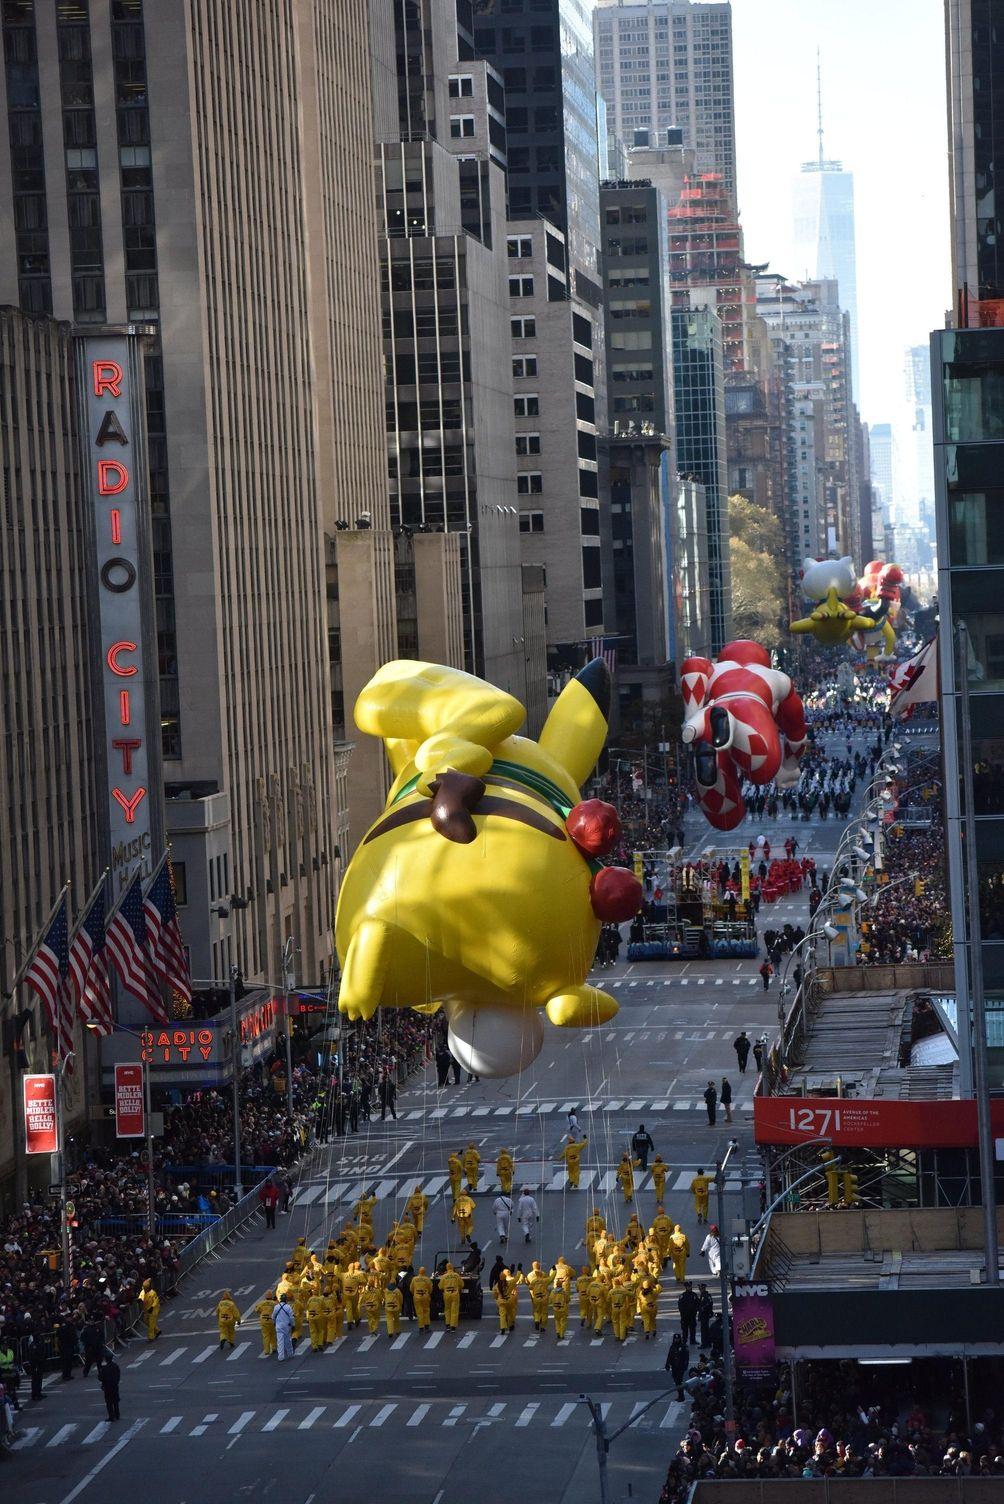 The Pikachu Pokemon paraded down Sixth Avenue near